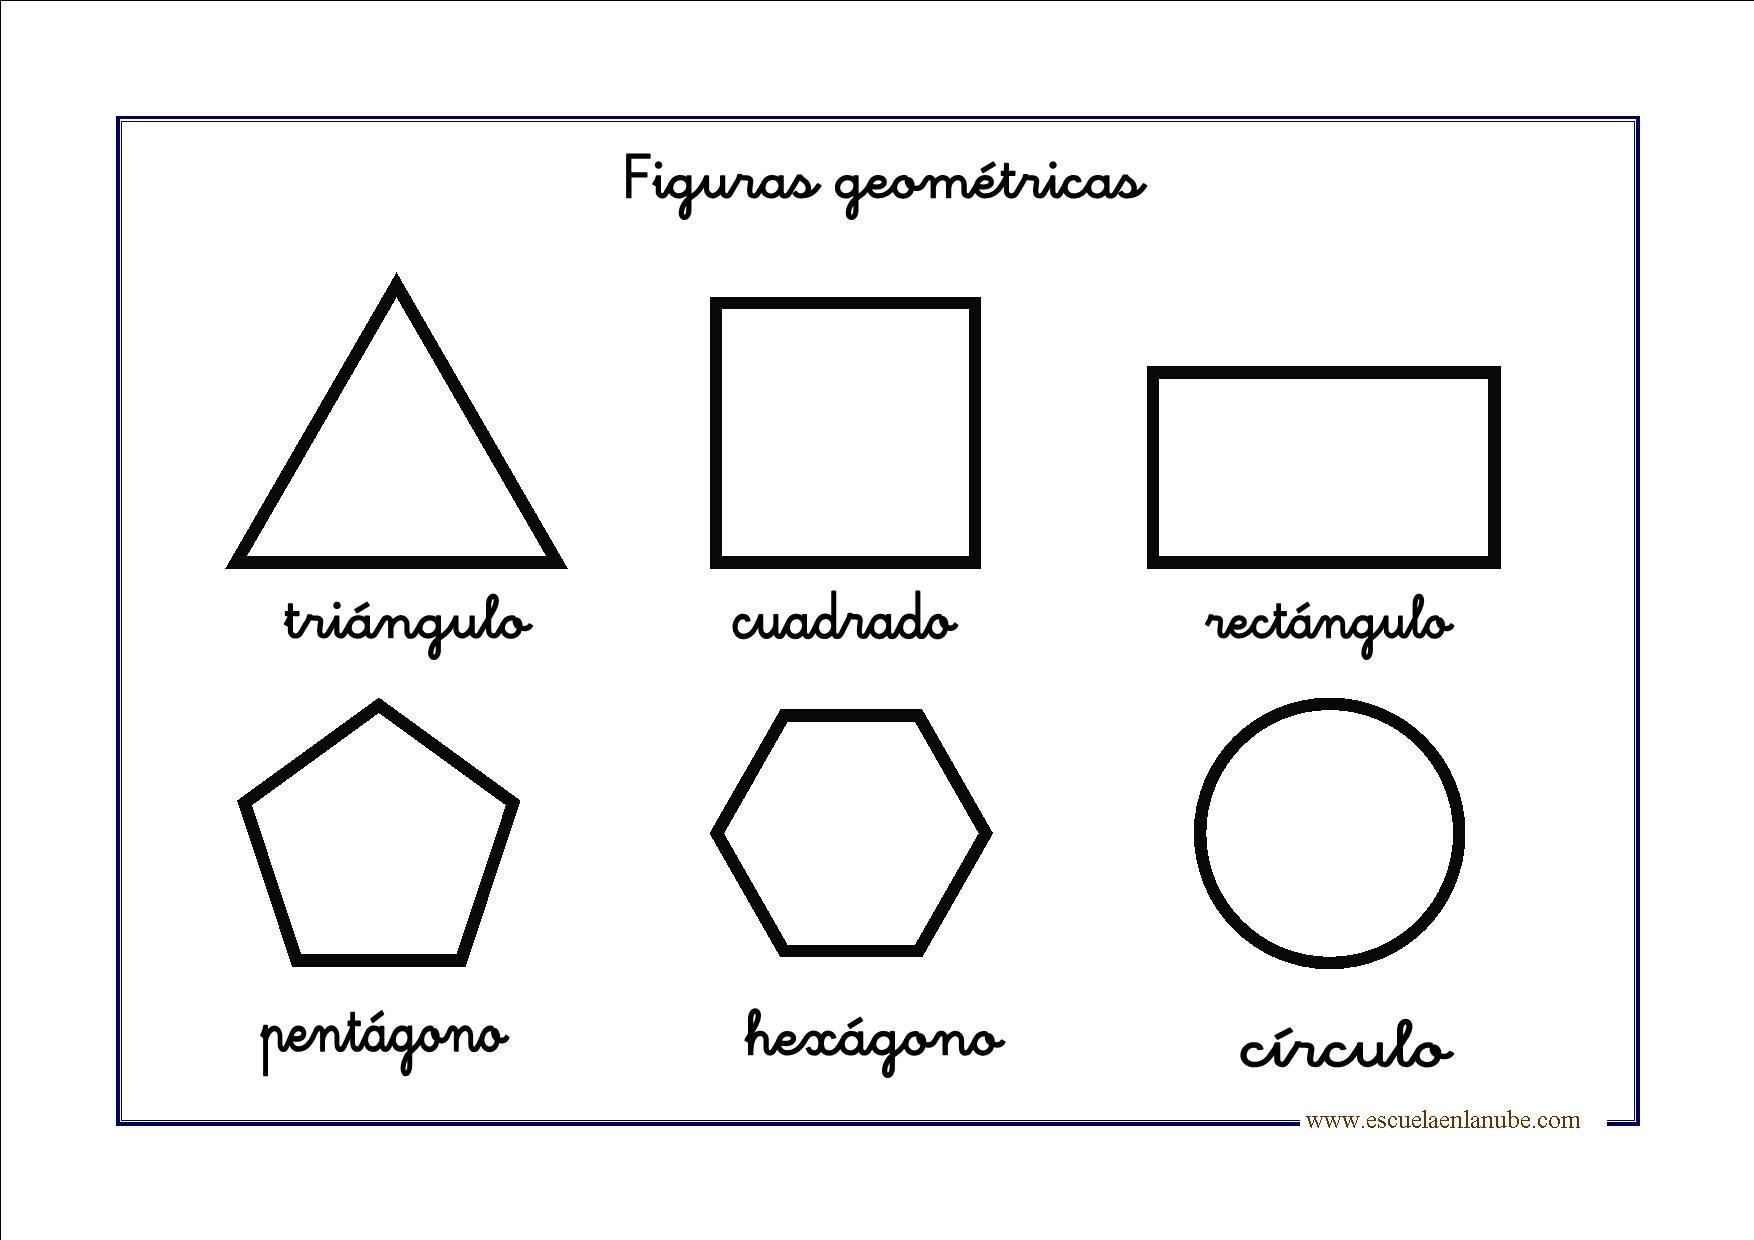 Figuras geom tricas para infantil y primaria for Las formas geometricas